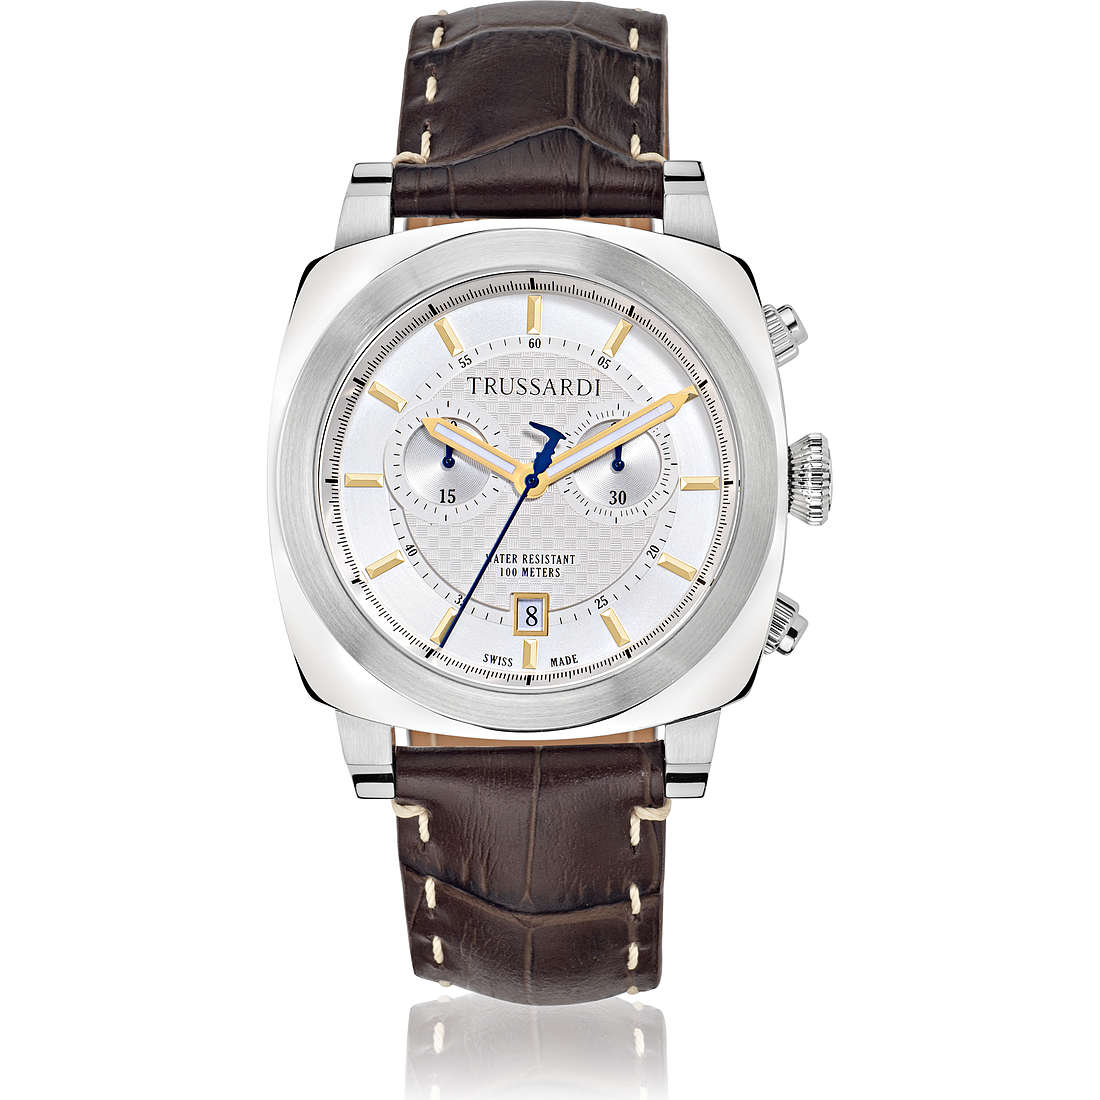 montre chronographe homme Trussardi 1911 R2471602002